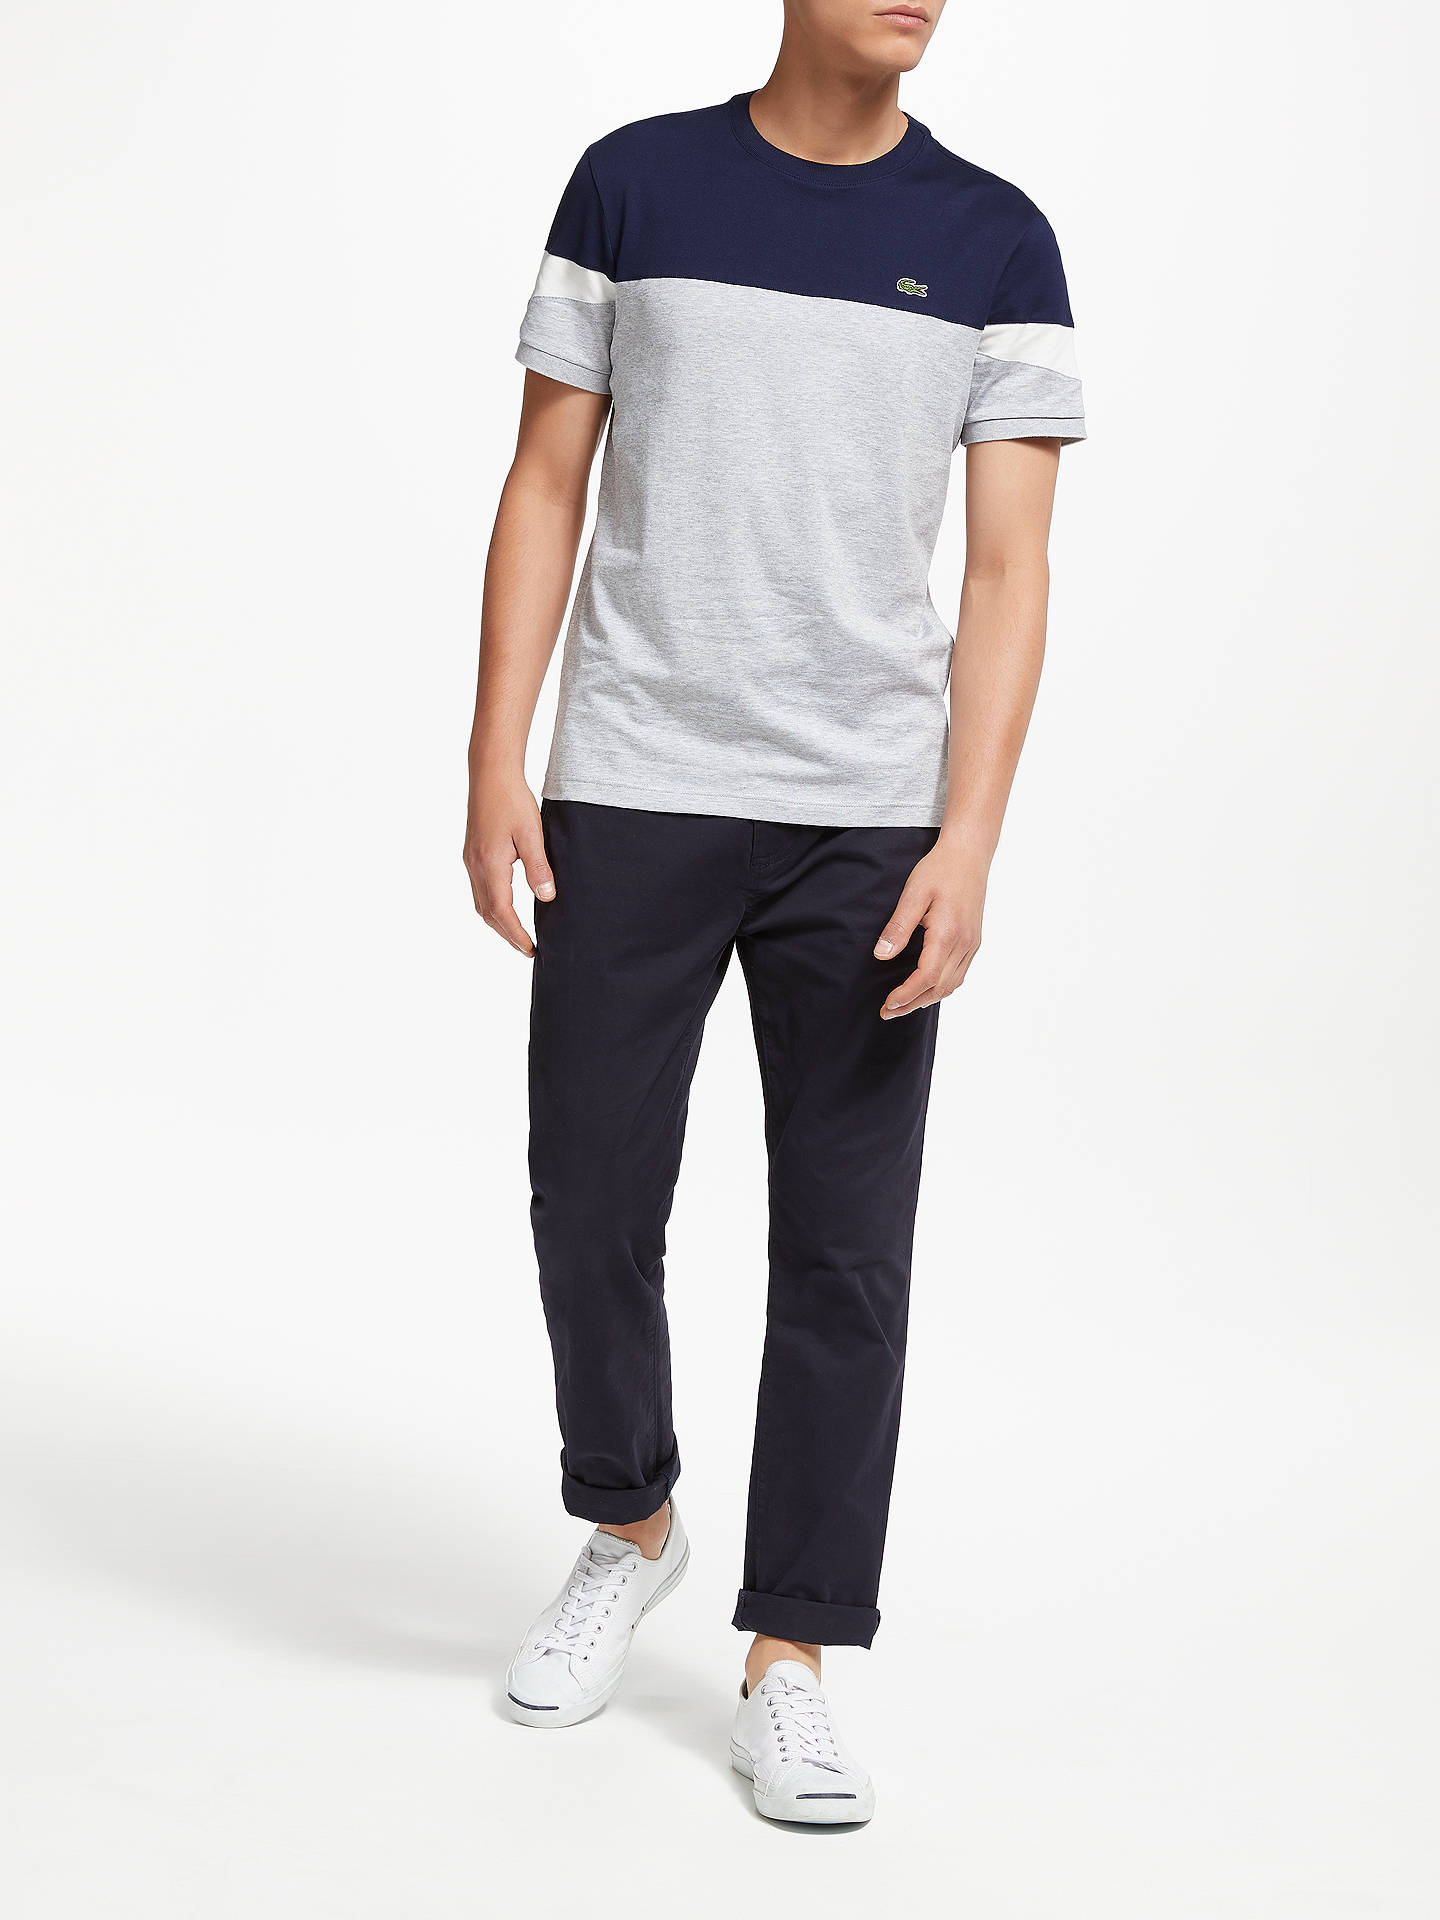 faa129c27 ... Buy Lacoste Short Sleeve Colour Block T-Shirt, Grey/Navy/White, ...